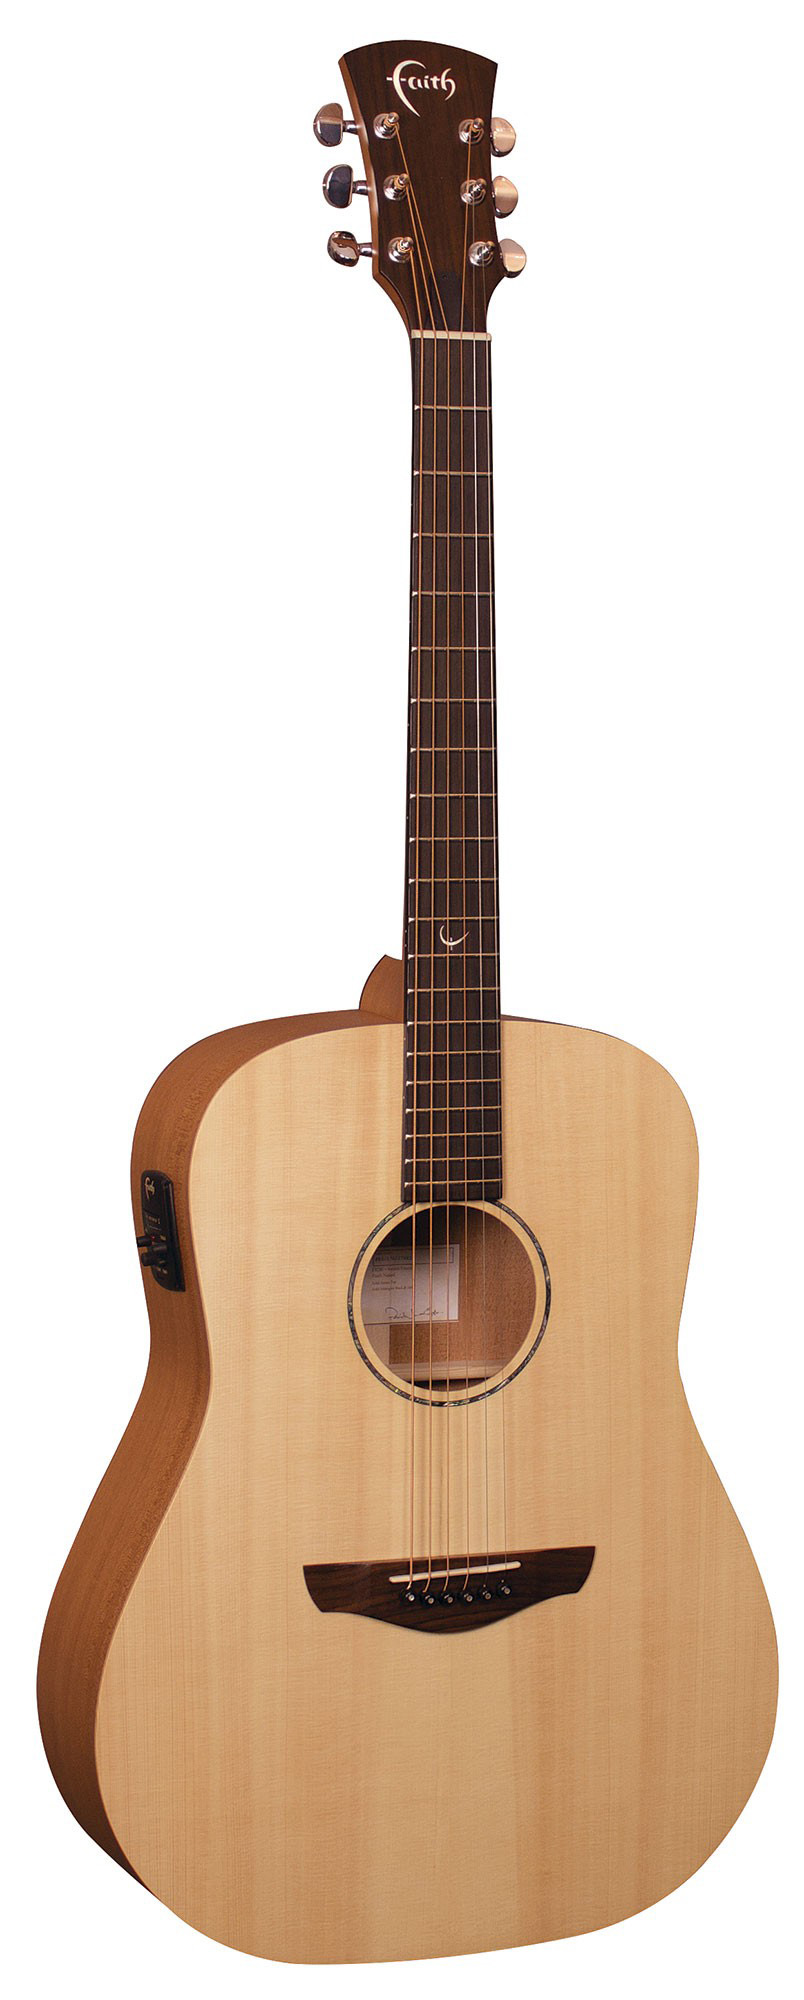 Faith Naked Saturn Dnought: Acoustic Guitar